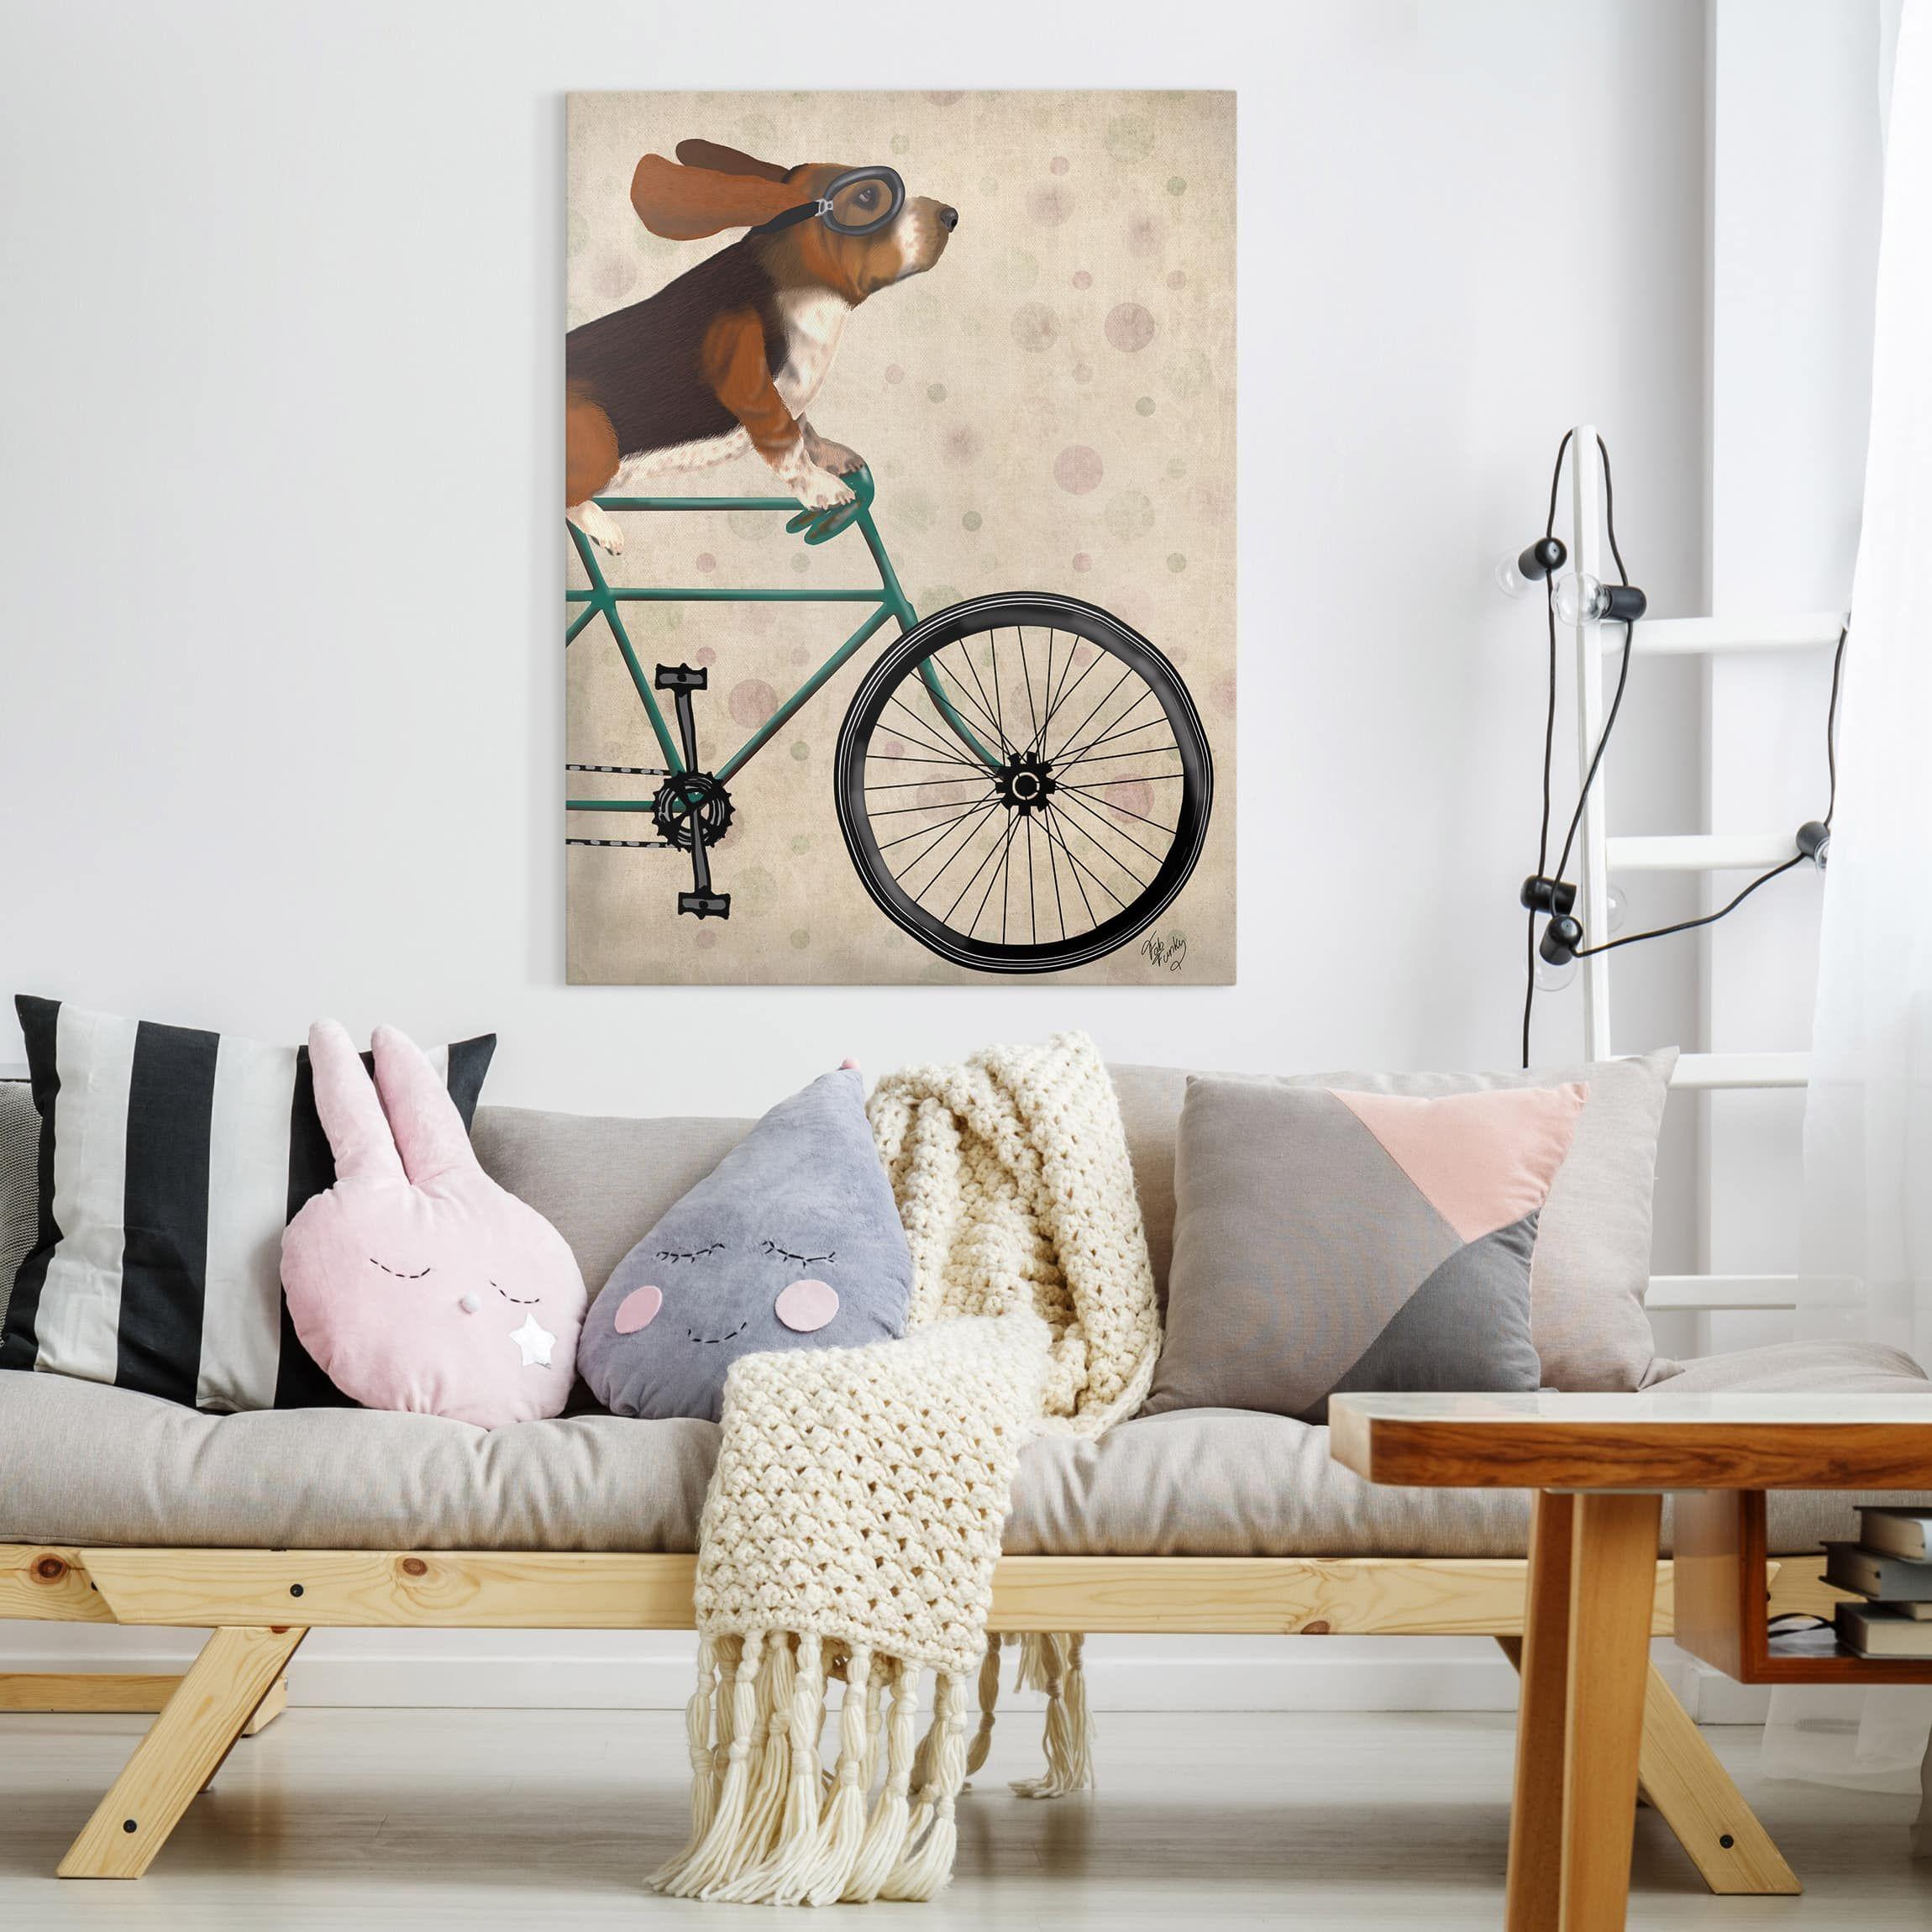 leinwandbild radtour basset auf fahrrad hochformat 4 3 leinwandbilder leinwand wandbilder fotoleinwand online bestellen bilddruck